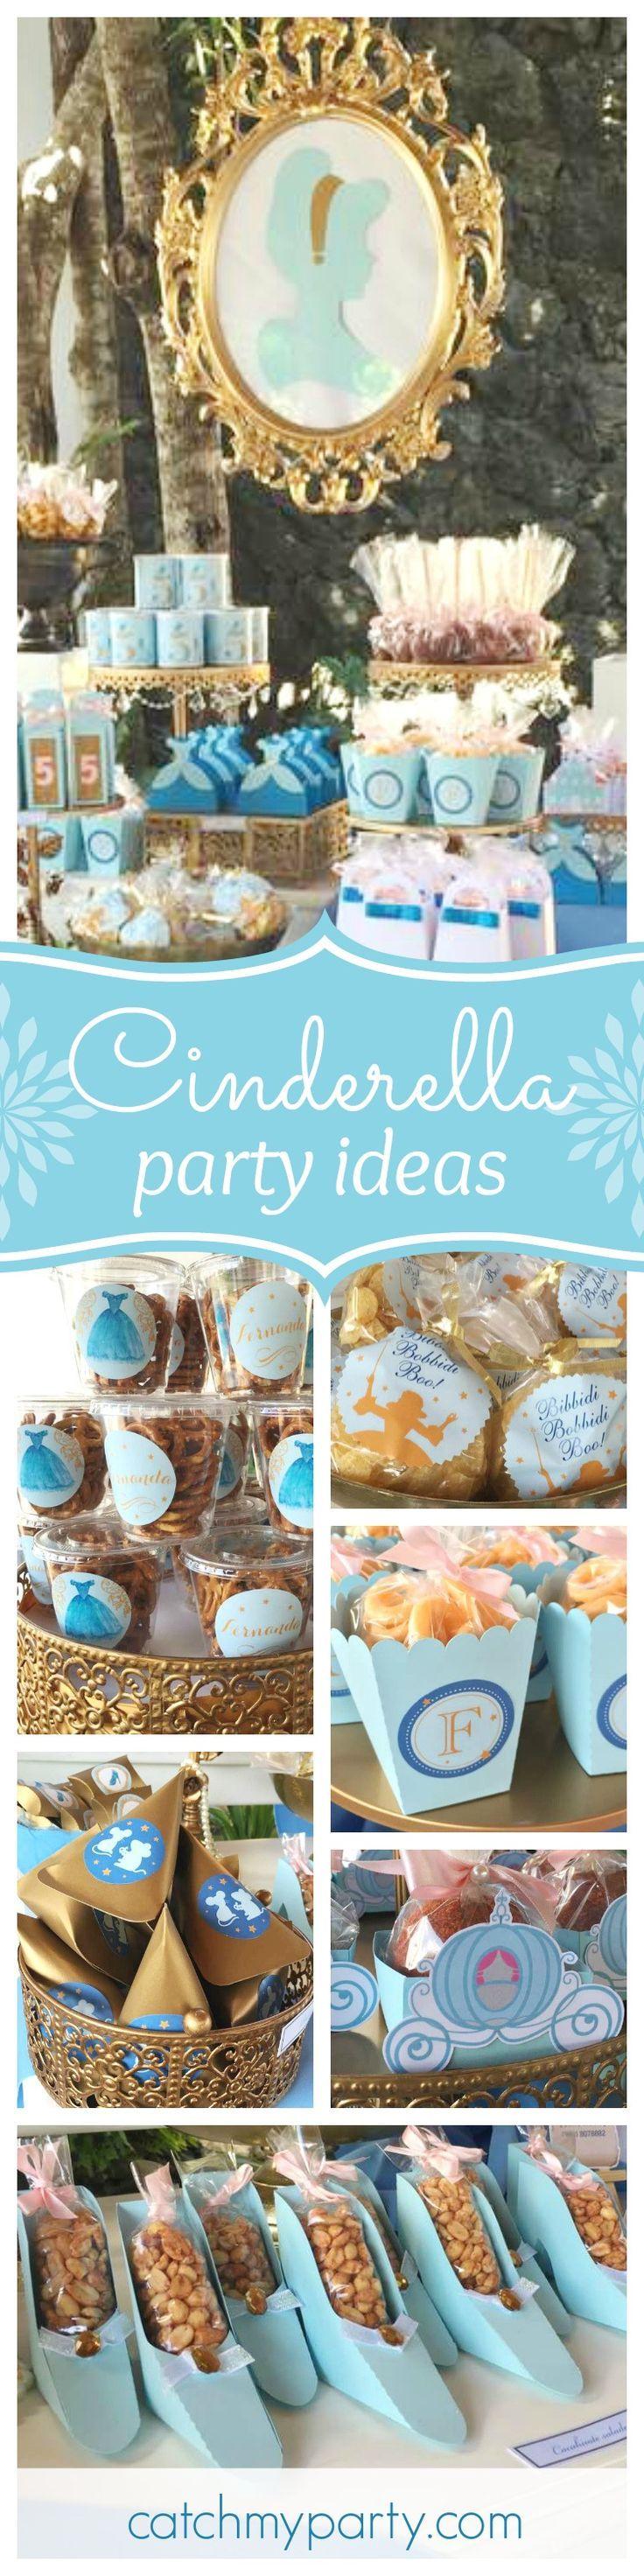 Birthday Cinderella Birthday Party Dessert Table Birthdays And